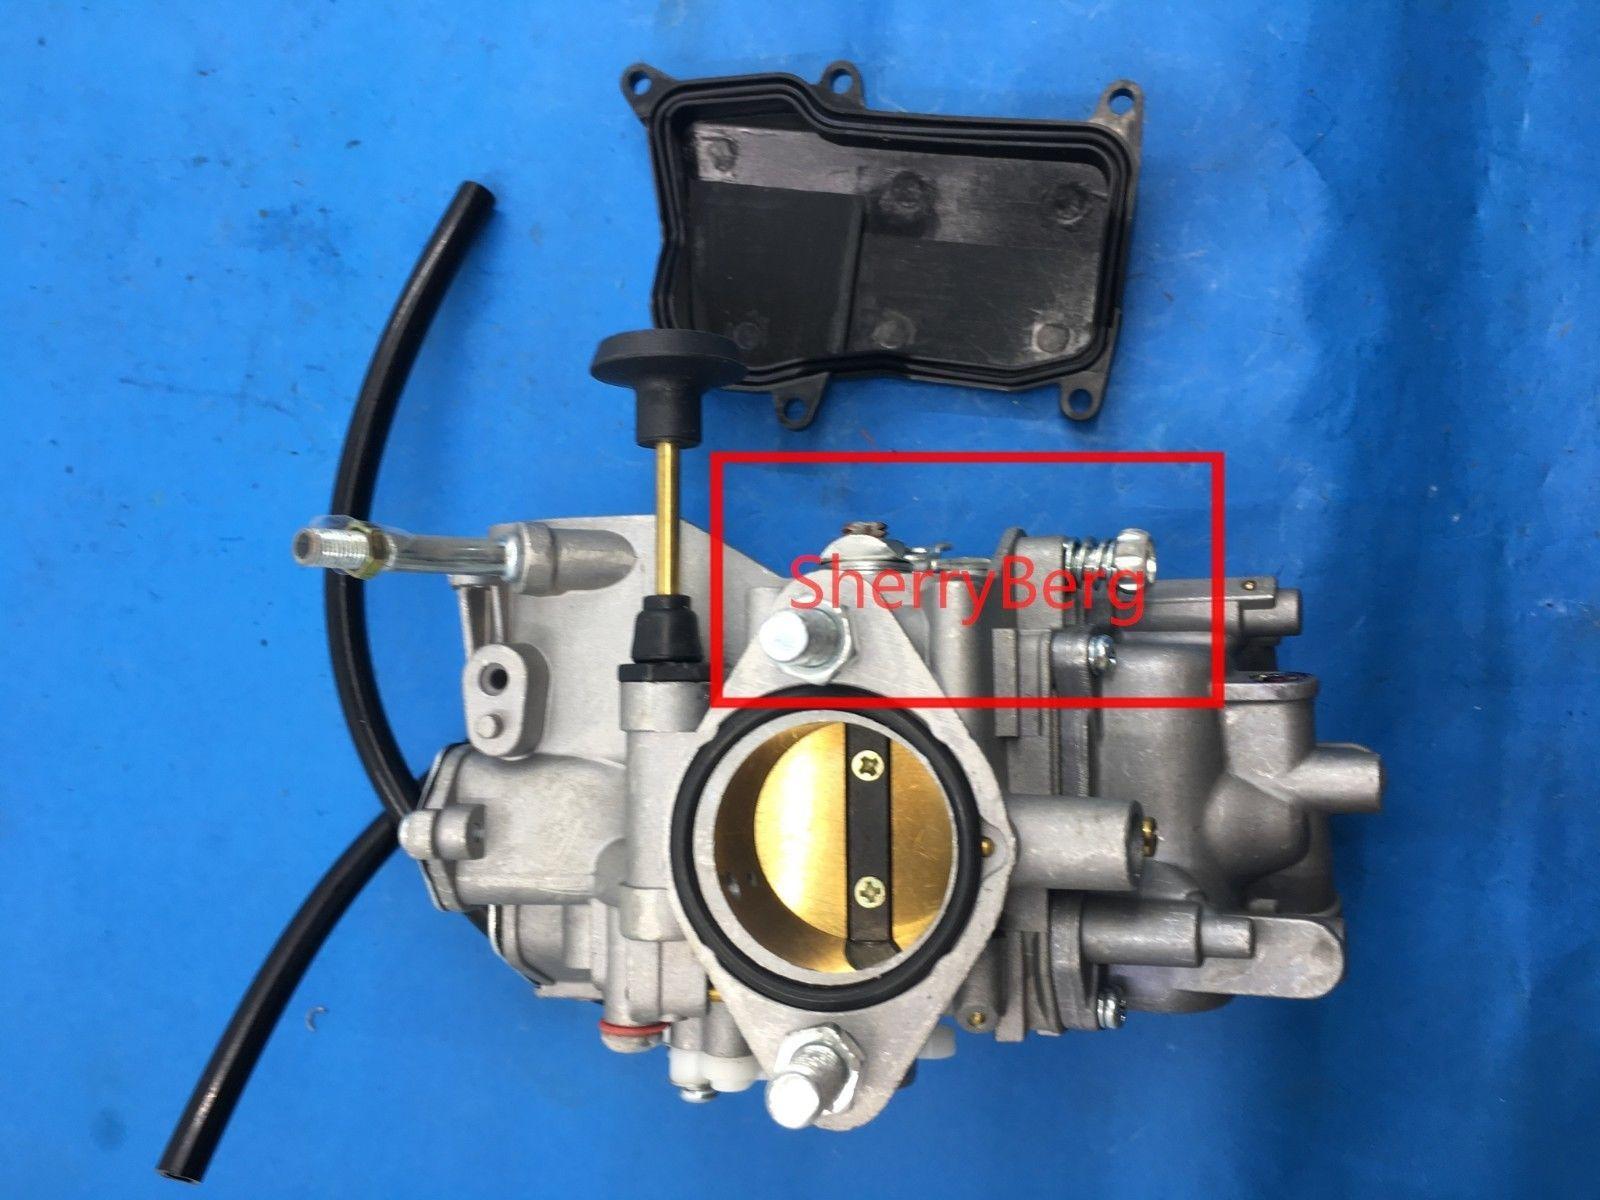 36mm carburetor carb fit yamaha warrior 350 2018 36mm carburetor carb fit yamaha warrior 350 yfm350 1993 1994